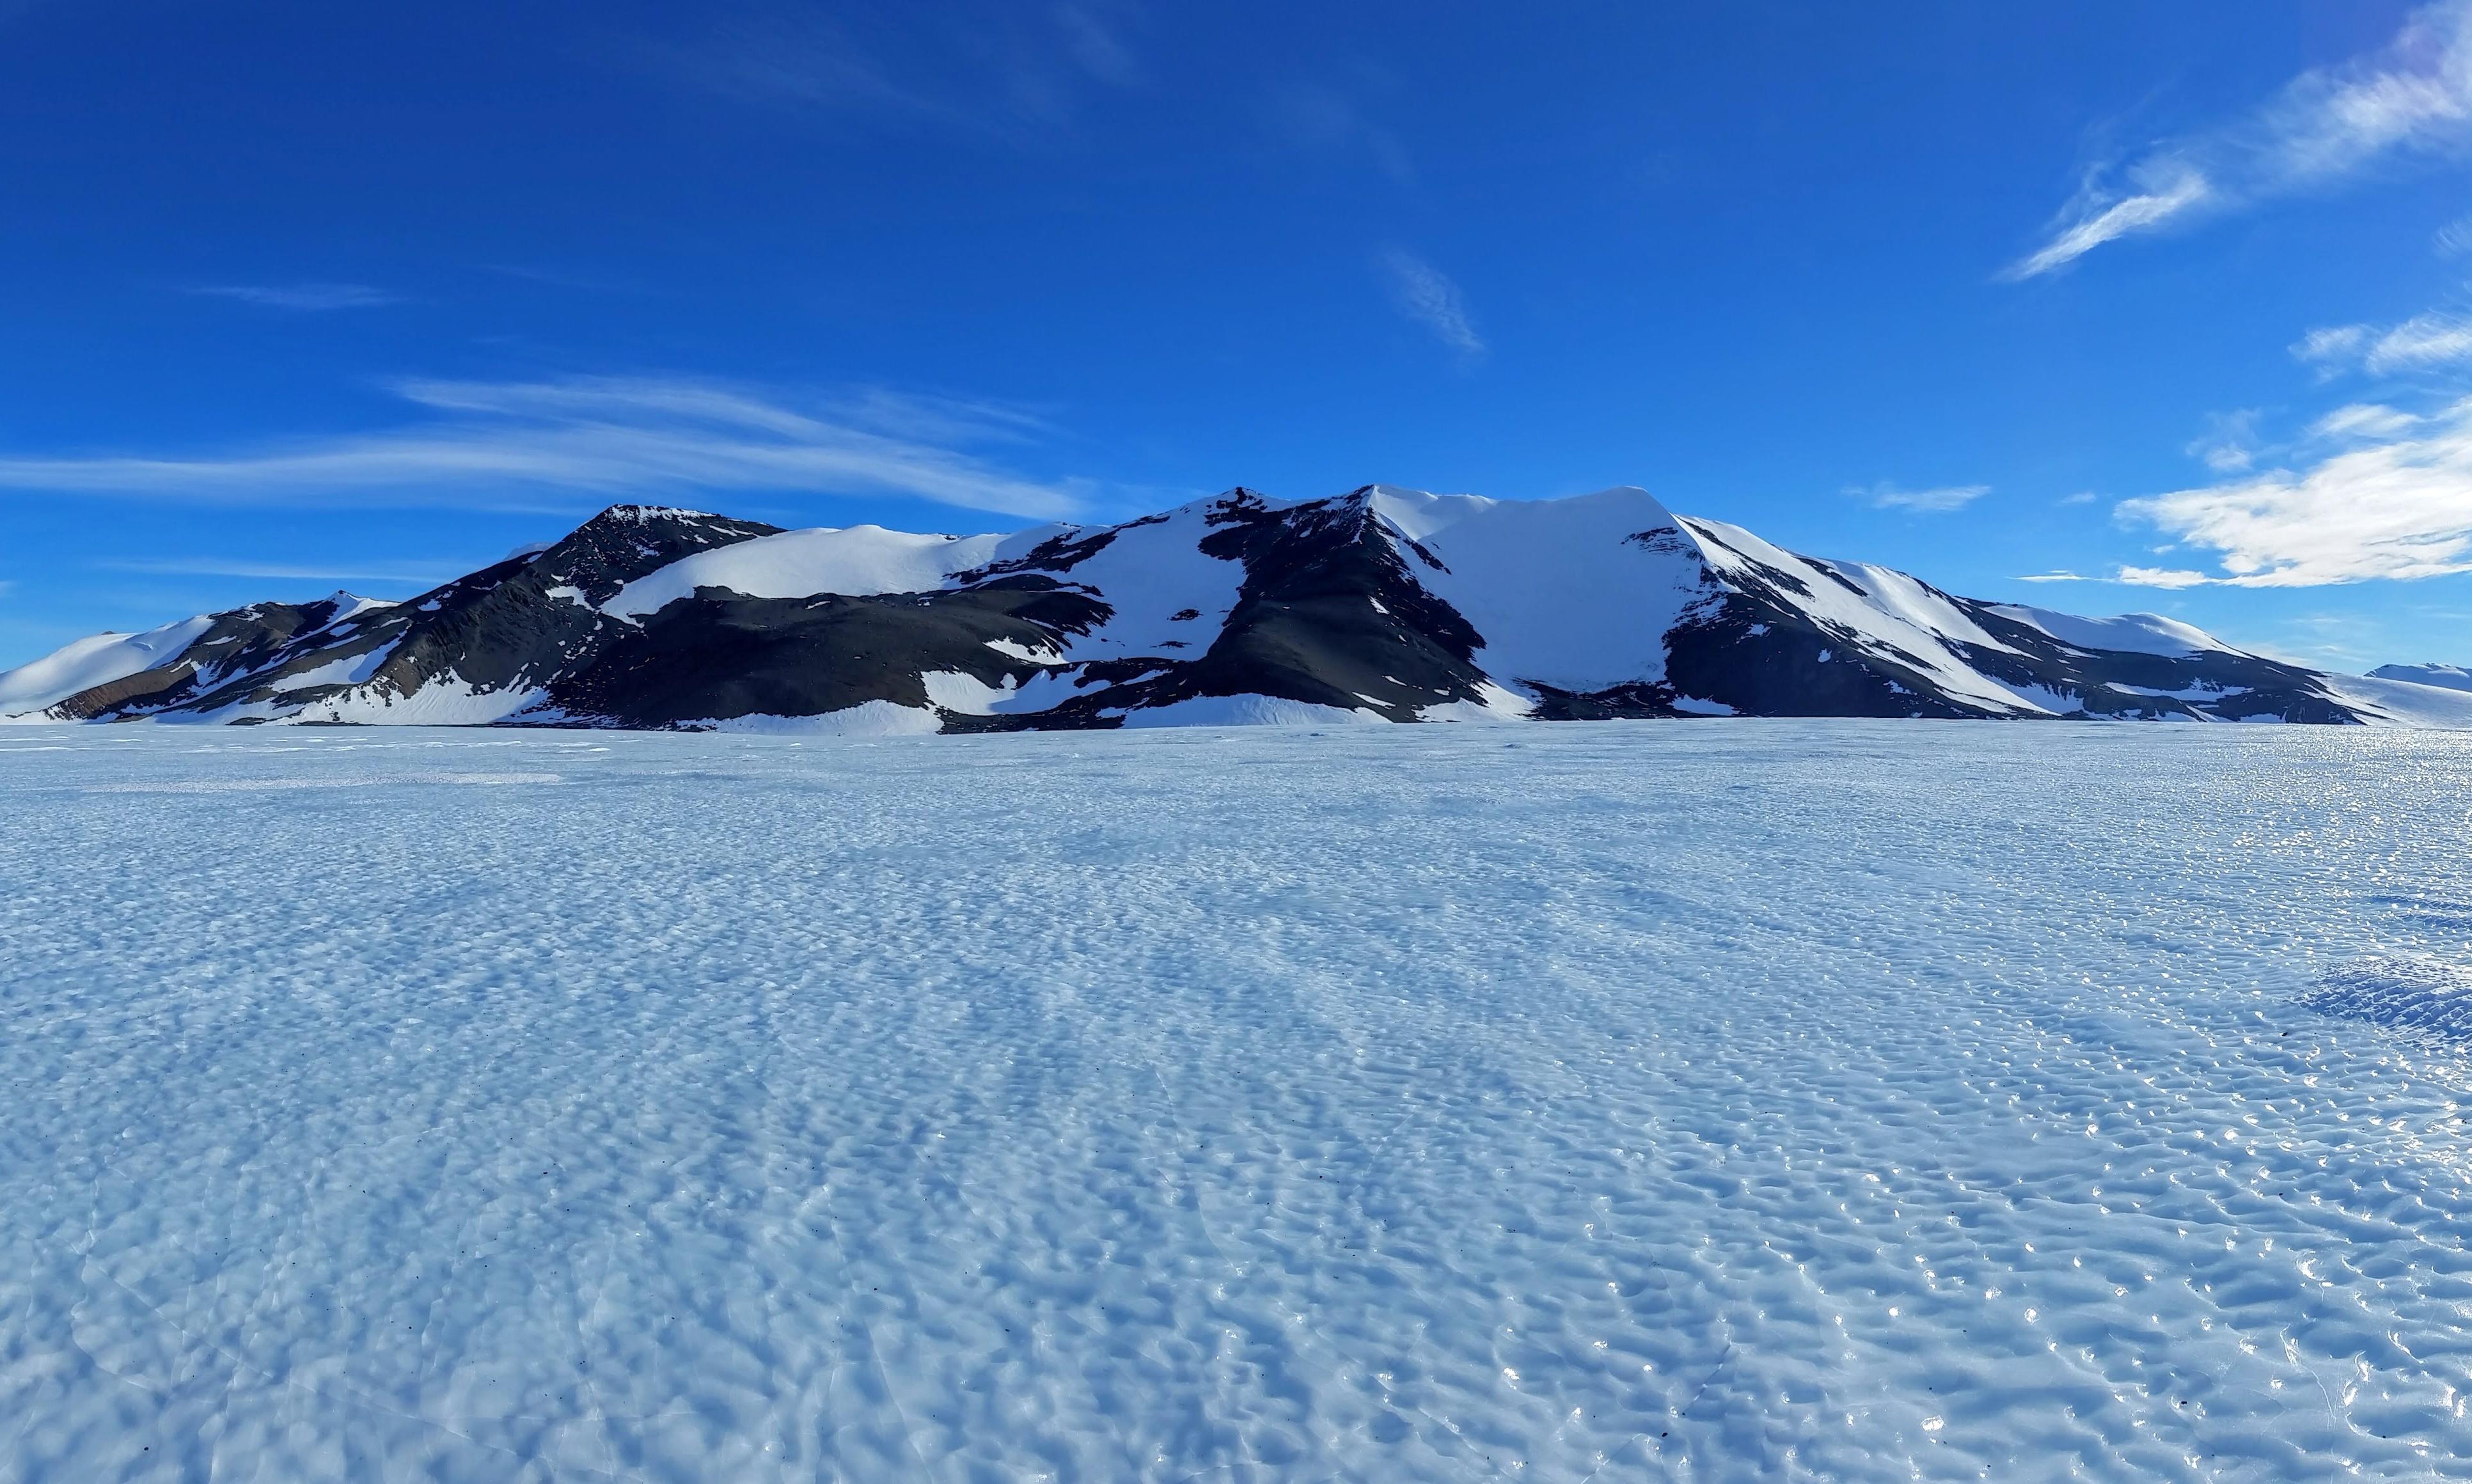 Mass melting of Antarctic ice sheet led to three metre sea level rise 120,000 years ago